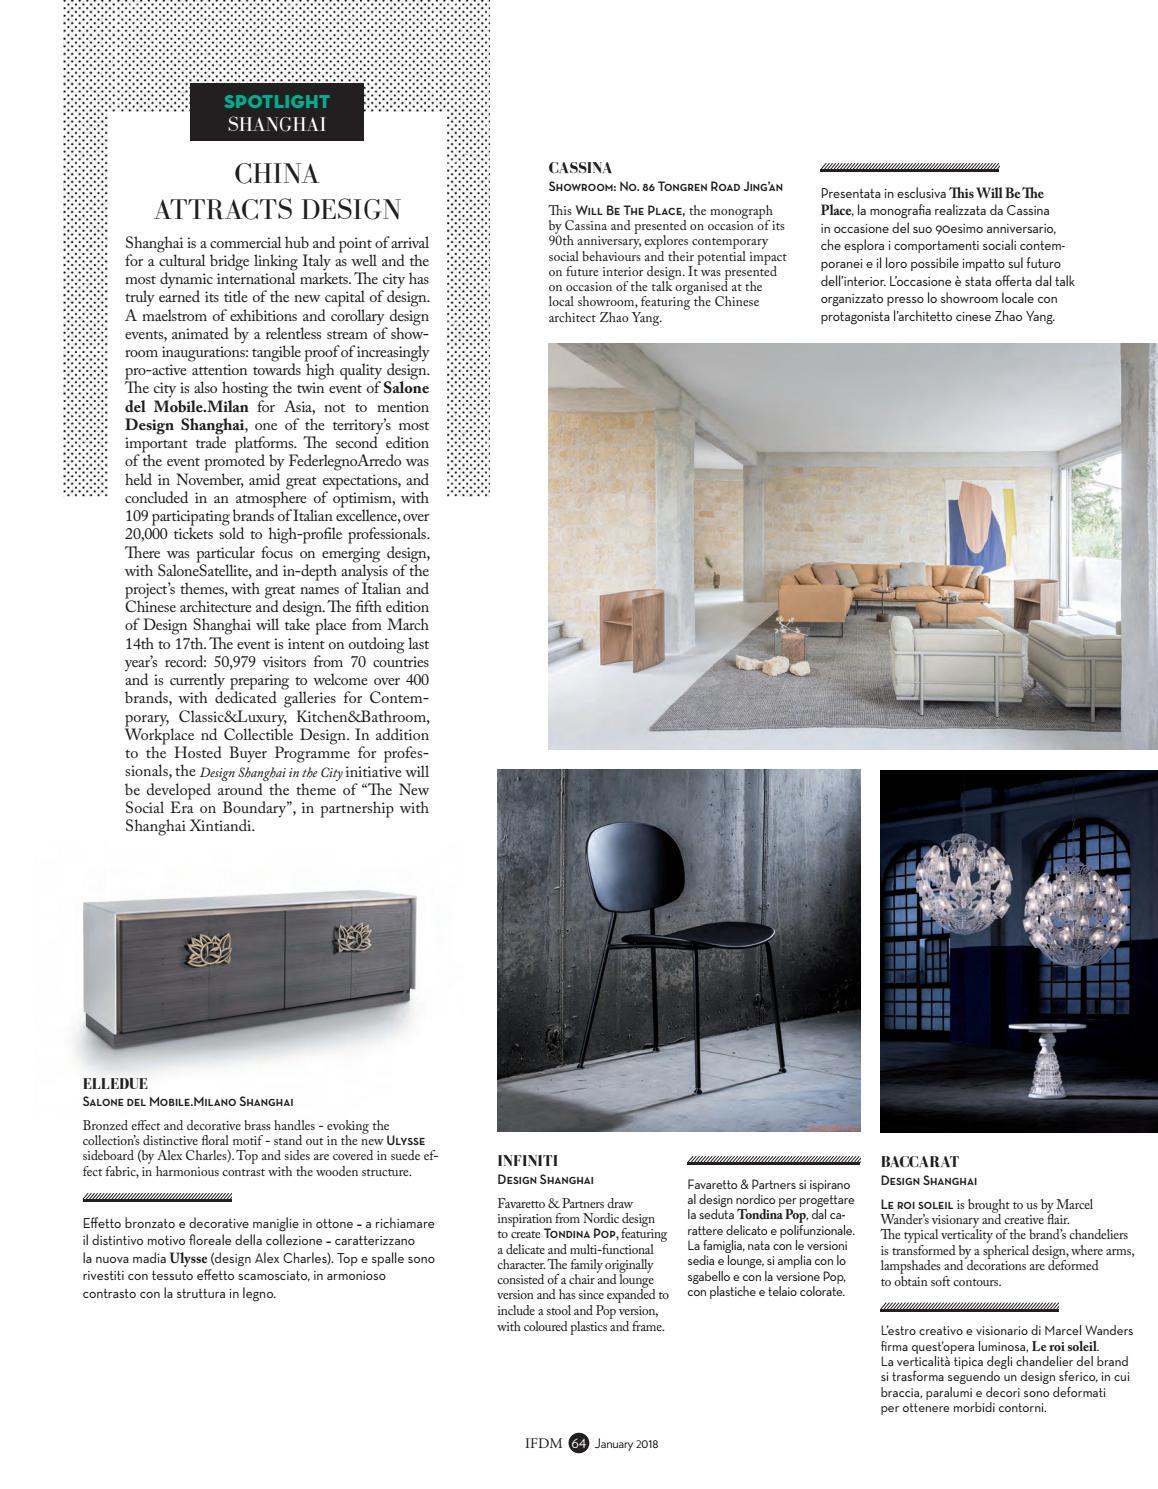 Sgabelli Colorati Interior Design.Ifdm N 1 2018 Europe Asia By Ifdm Issuu